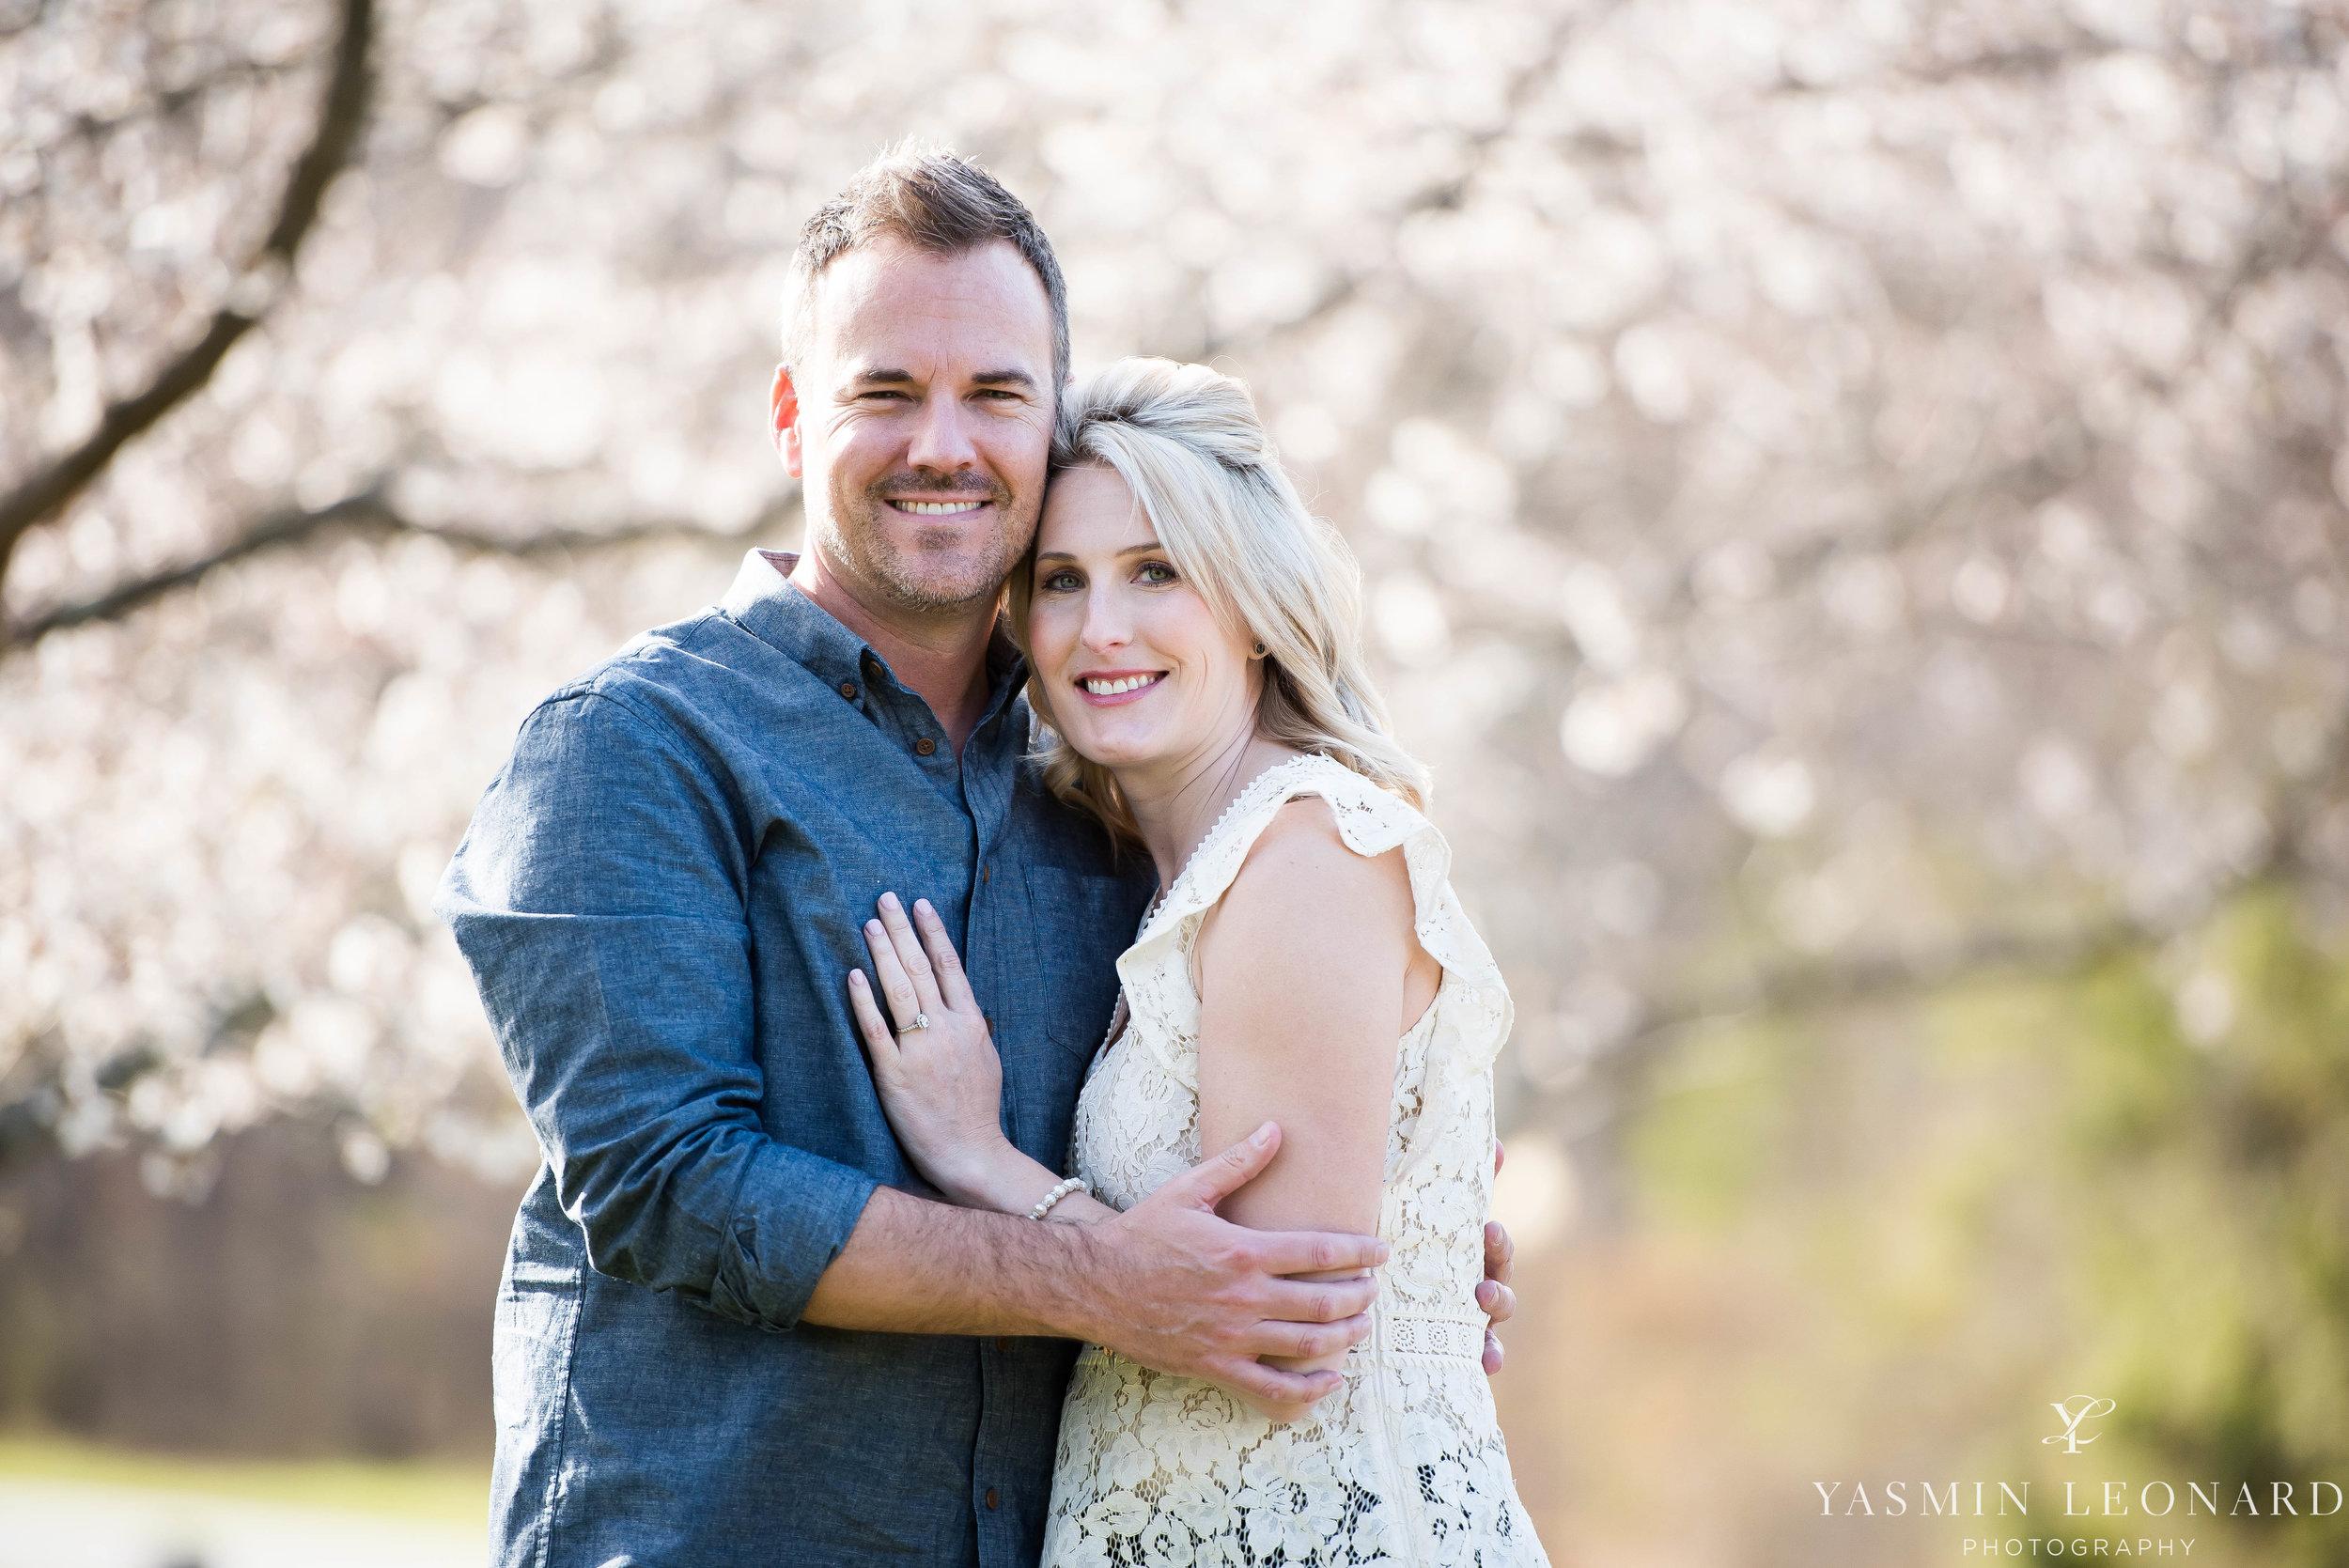 High Point Wedding Photographer - NC Wedding Photographer - Yasmin Leonard Photography - Engagement Poses - Engagement Ideas - Outdoor Engagement Session-12.jpg